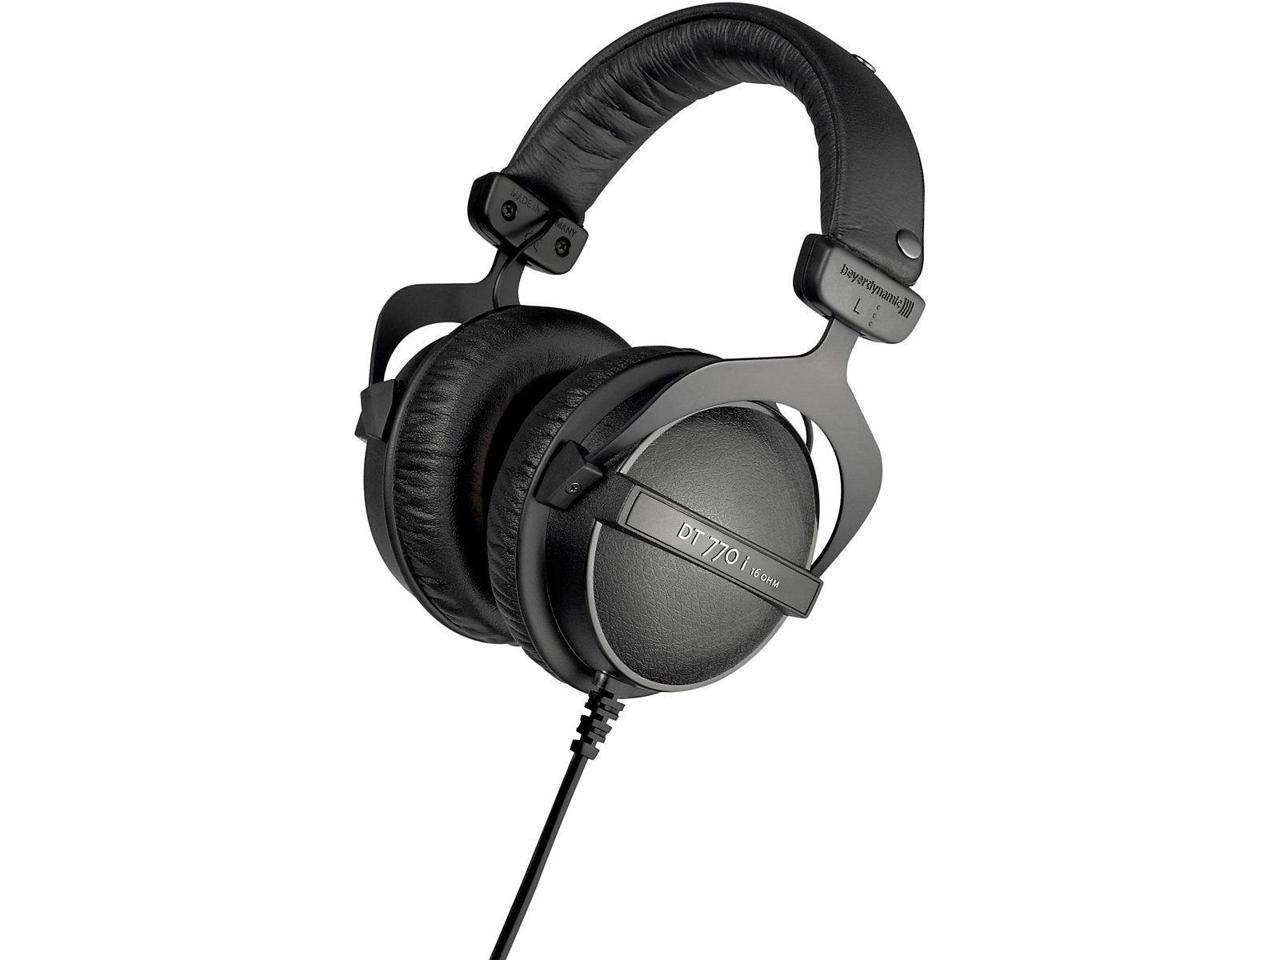 $99 - BeyerDynamic DT 770 Closed-Back Headphones 16 ohm